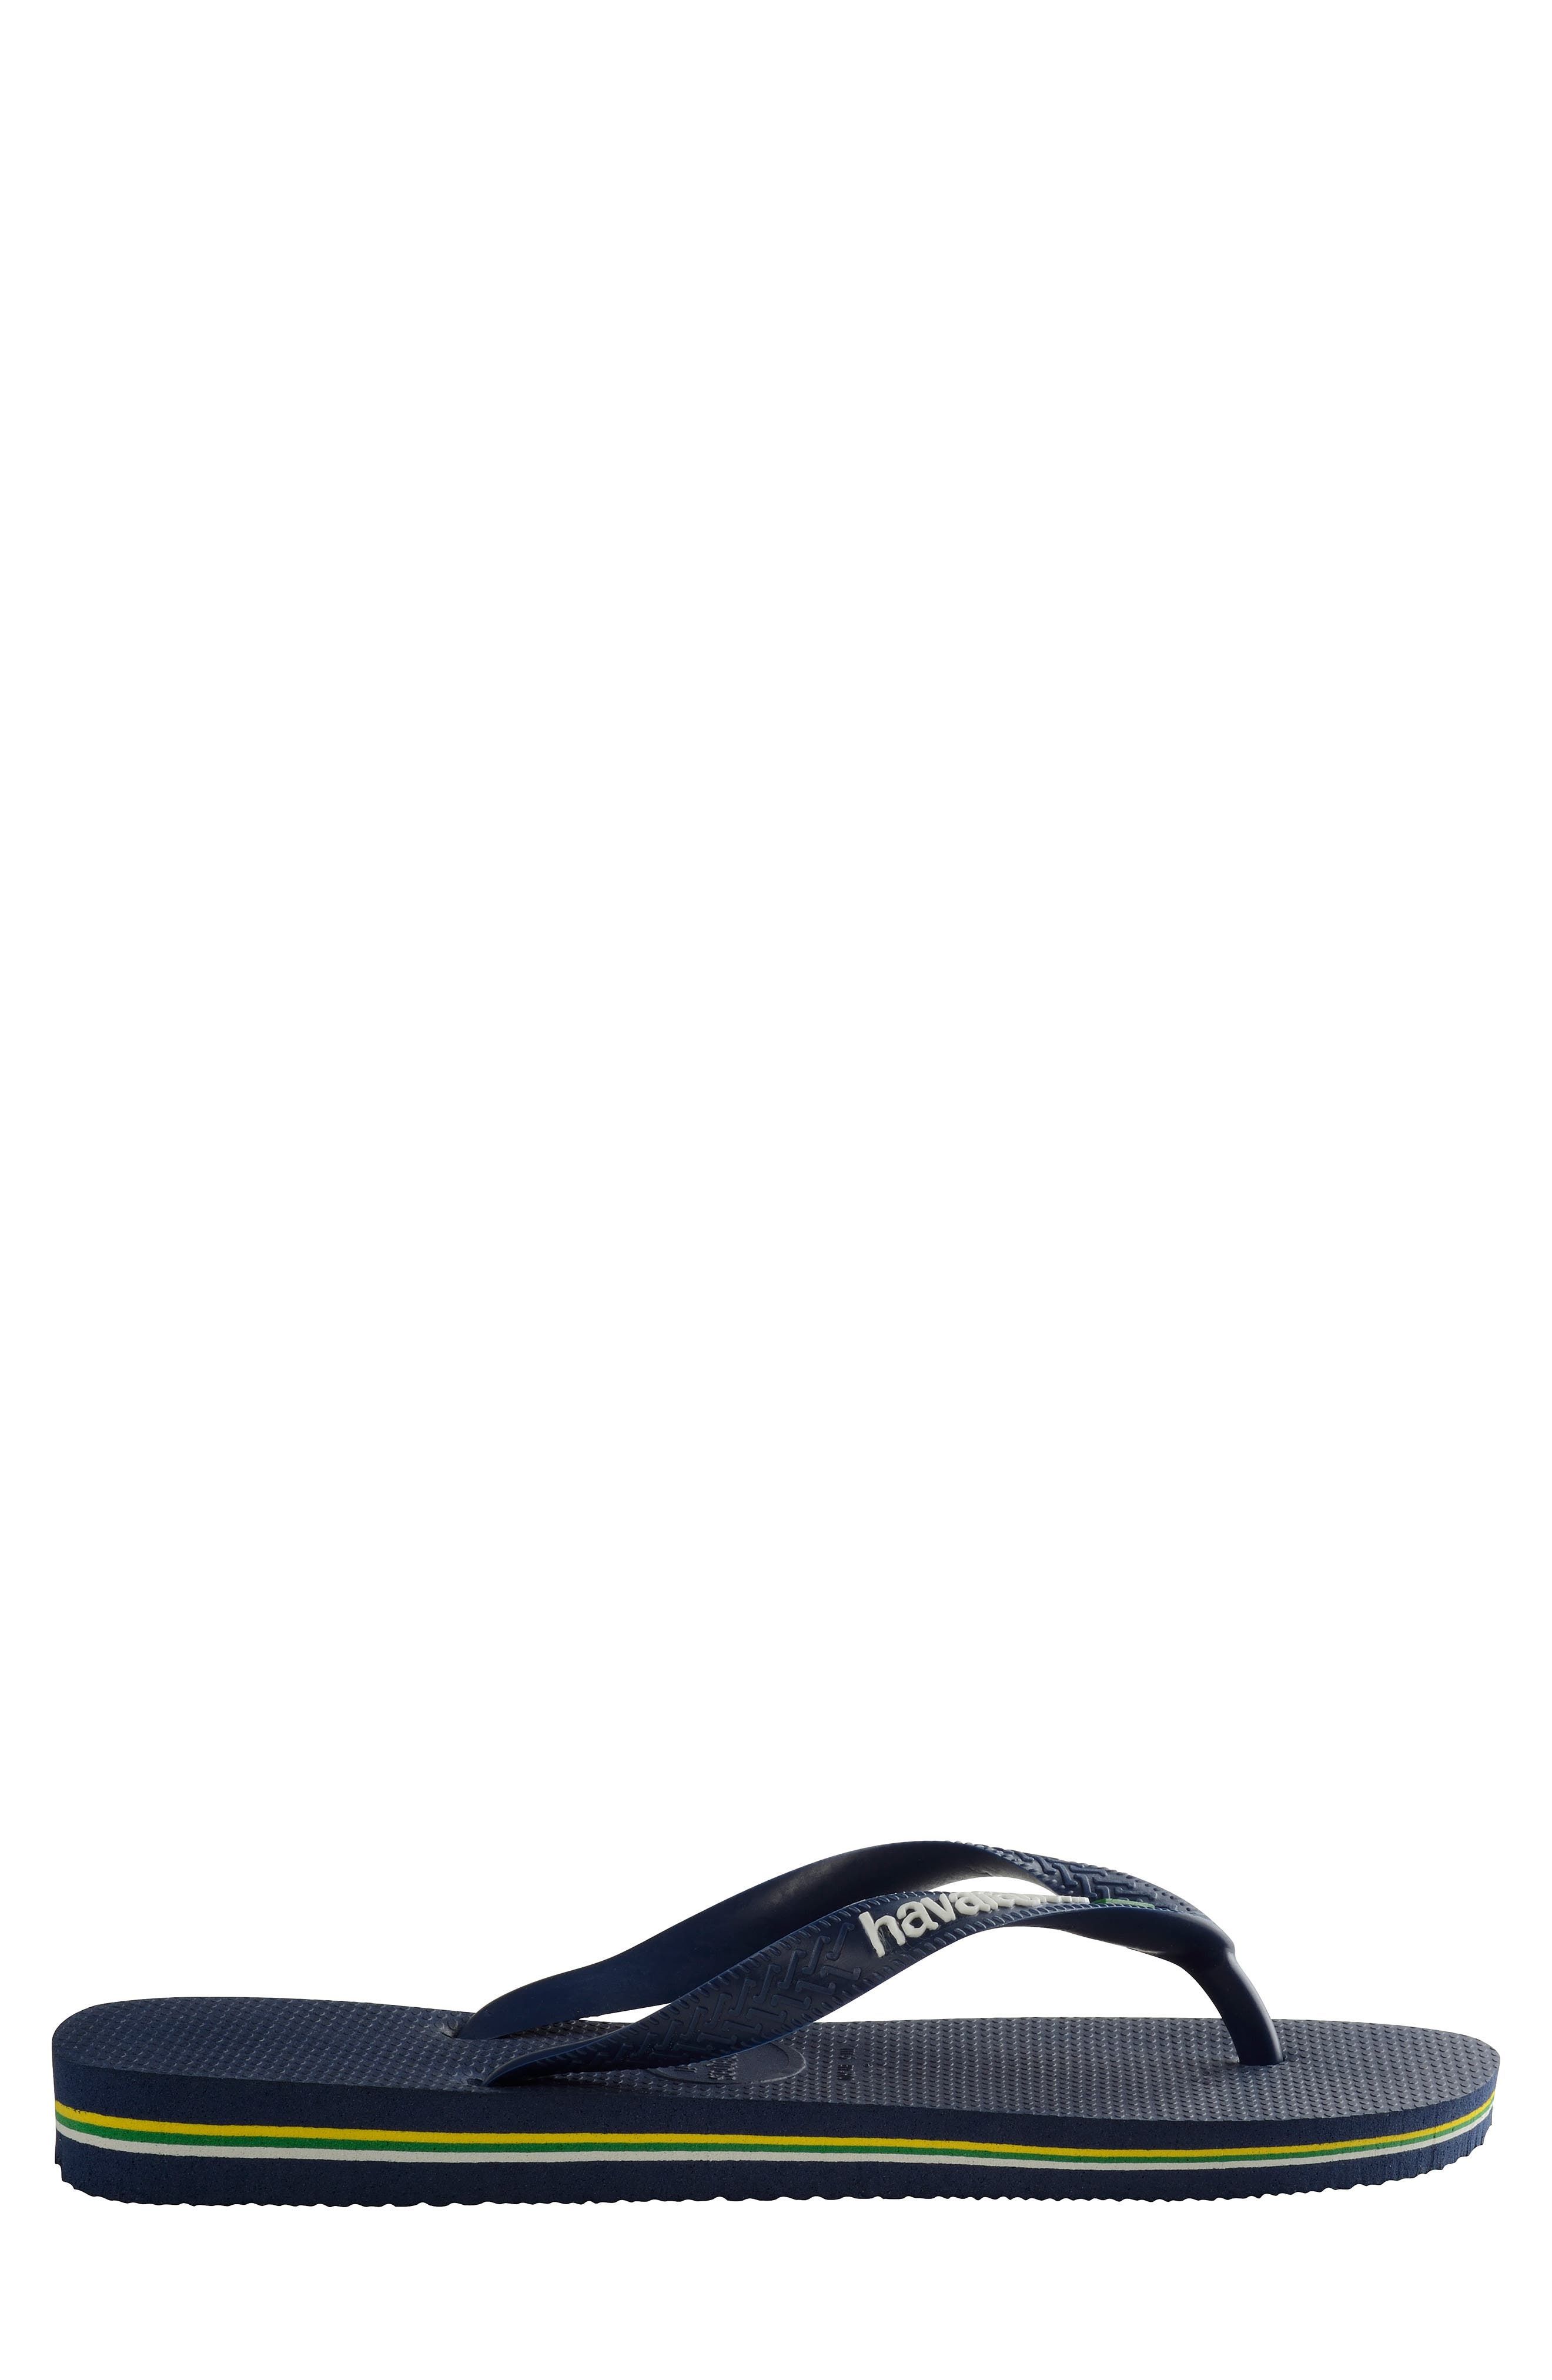 Brazil Flip Flop,                             Alternate thumbnail 4, color,                             NAVY BLUE